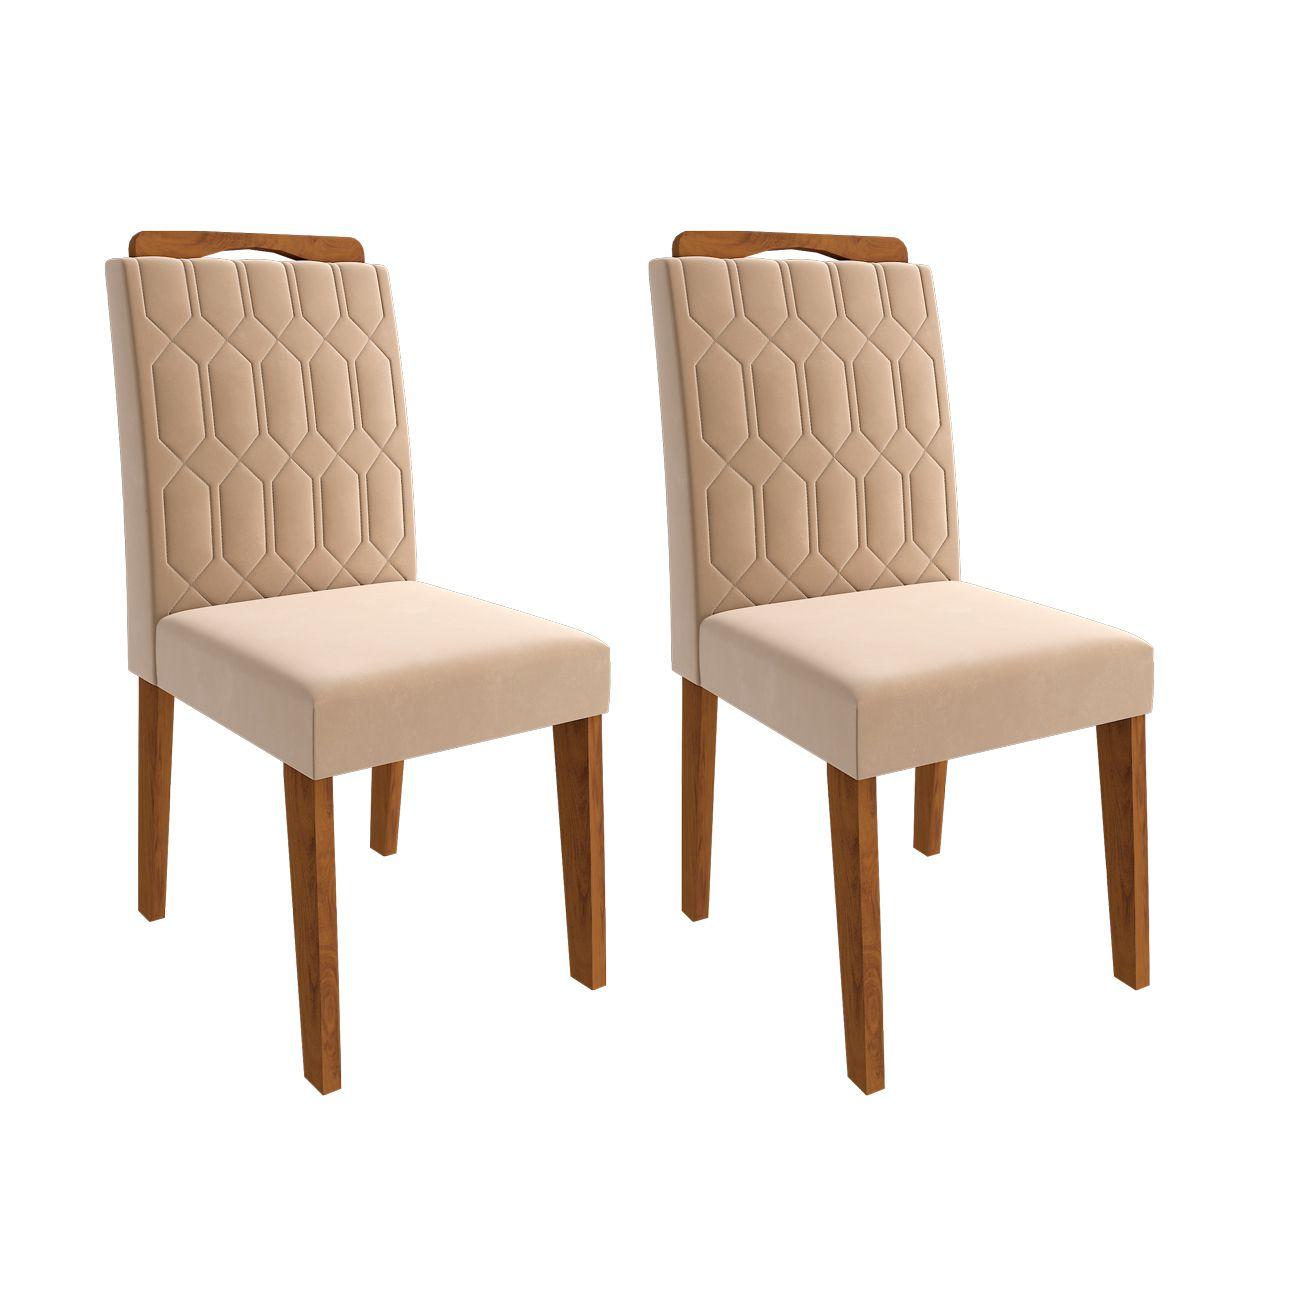 Conjunto 2 Cadeiras para Sala de Jantar 100% MDF Paola Cimol Savana/Nude